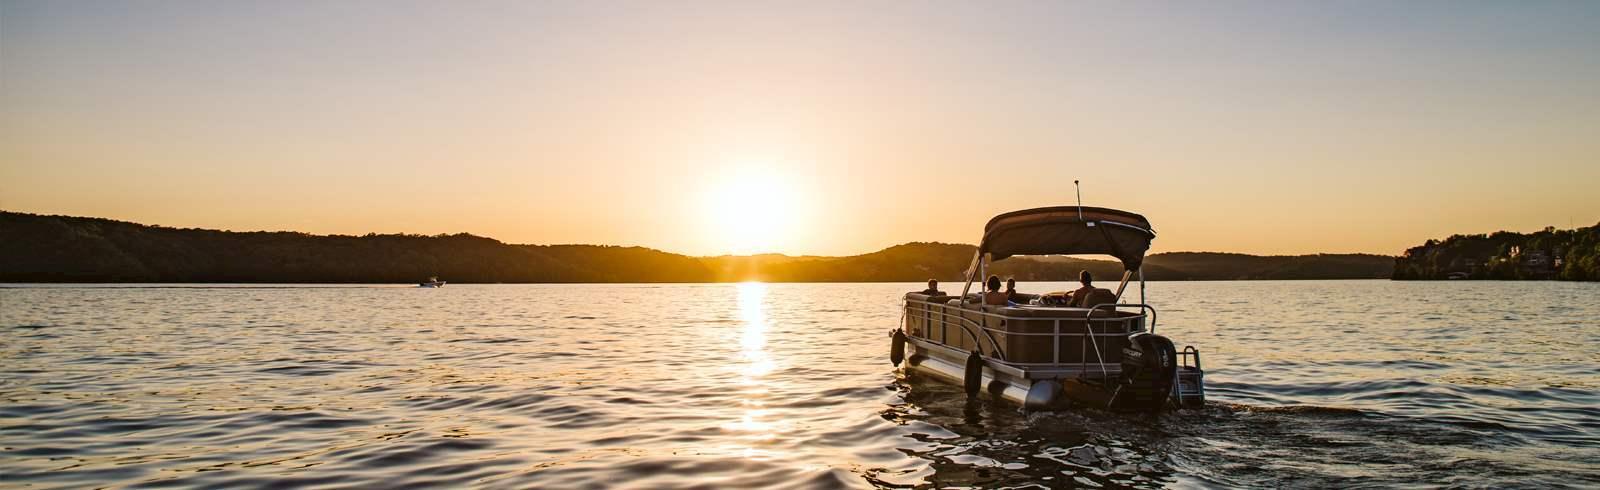 Margaritaville Lake Resort Lake of the Ozarks Osage Beach Missouri Special Offer